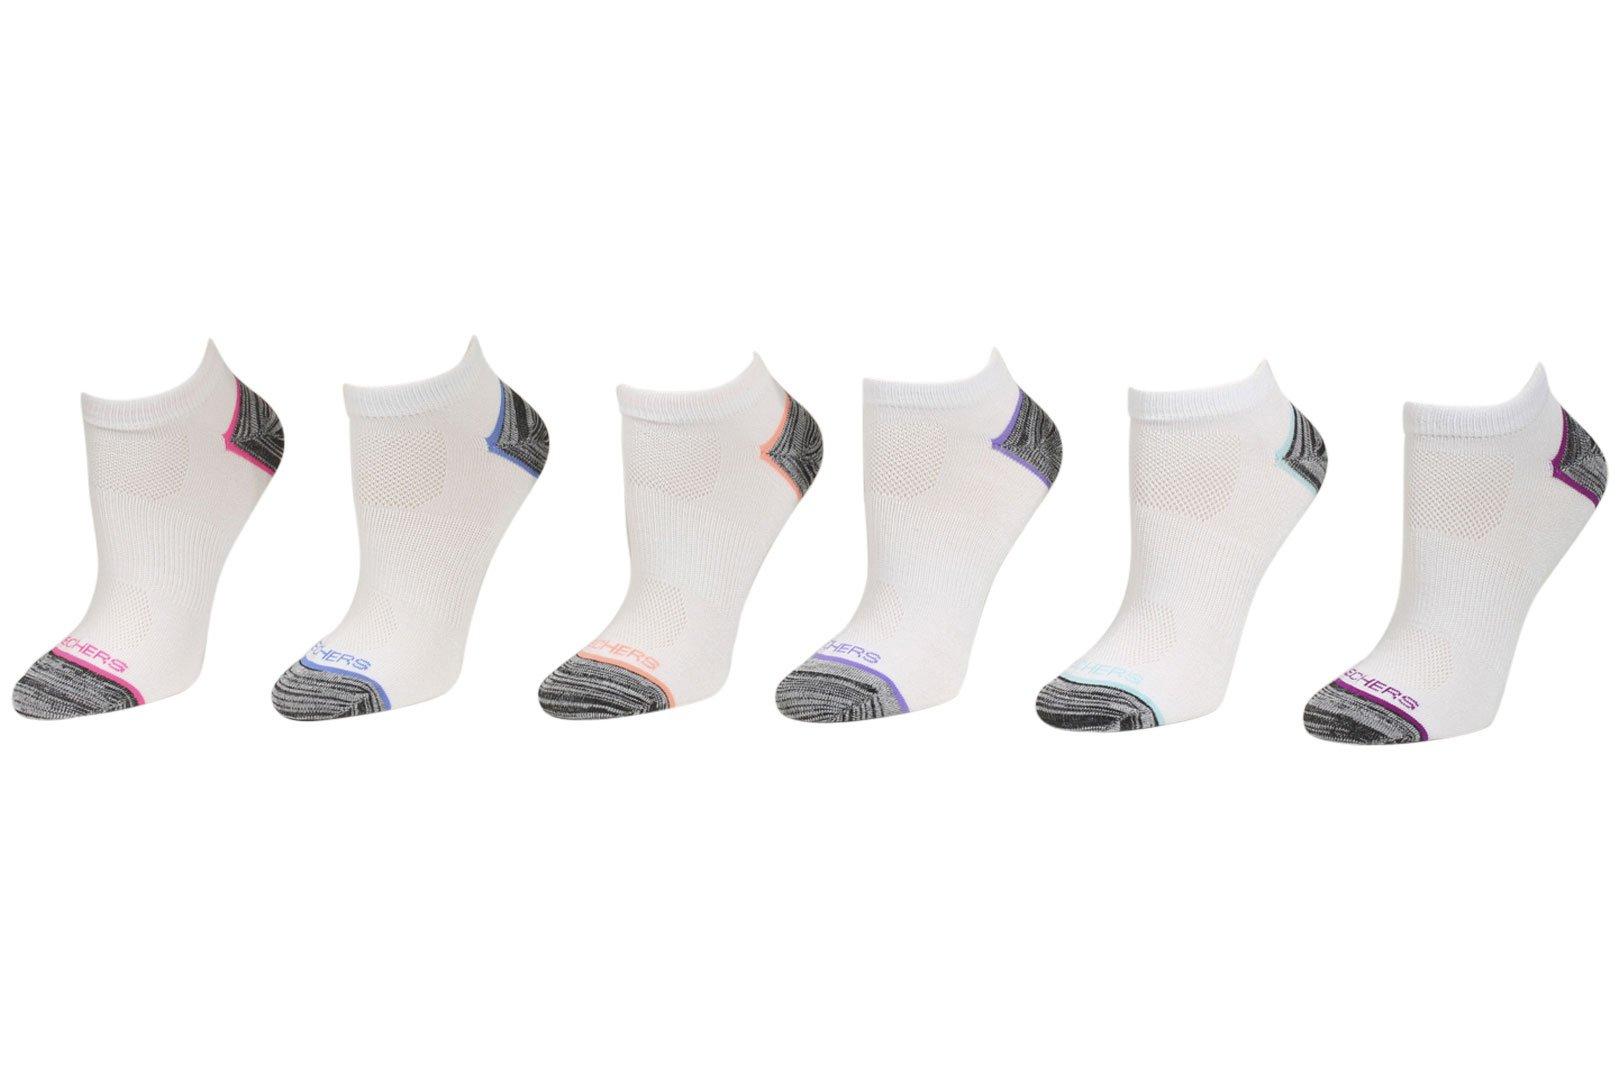 Skechers Active 6-Pairs White/Black Lightweight Low Cut Socks Sz 9-11 Fits 5-9.5